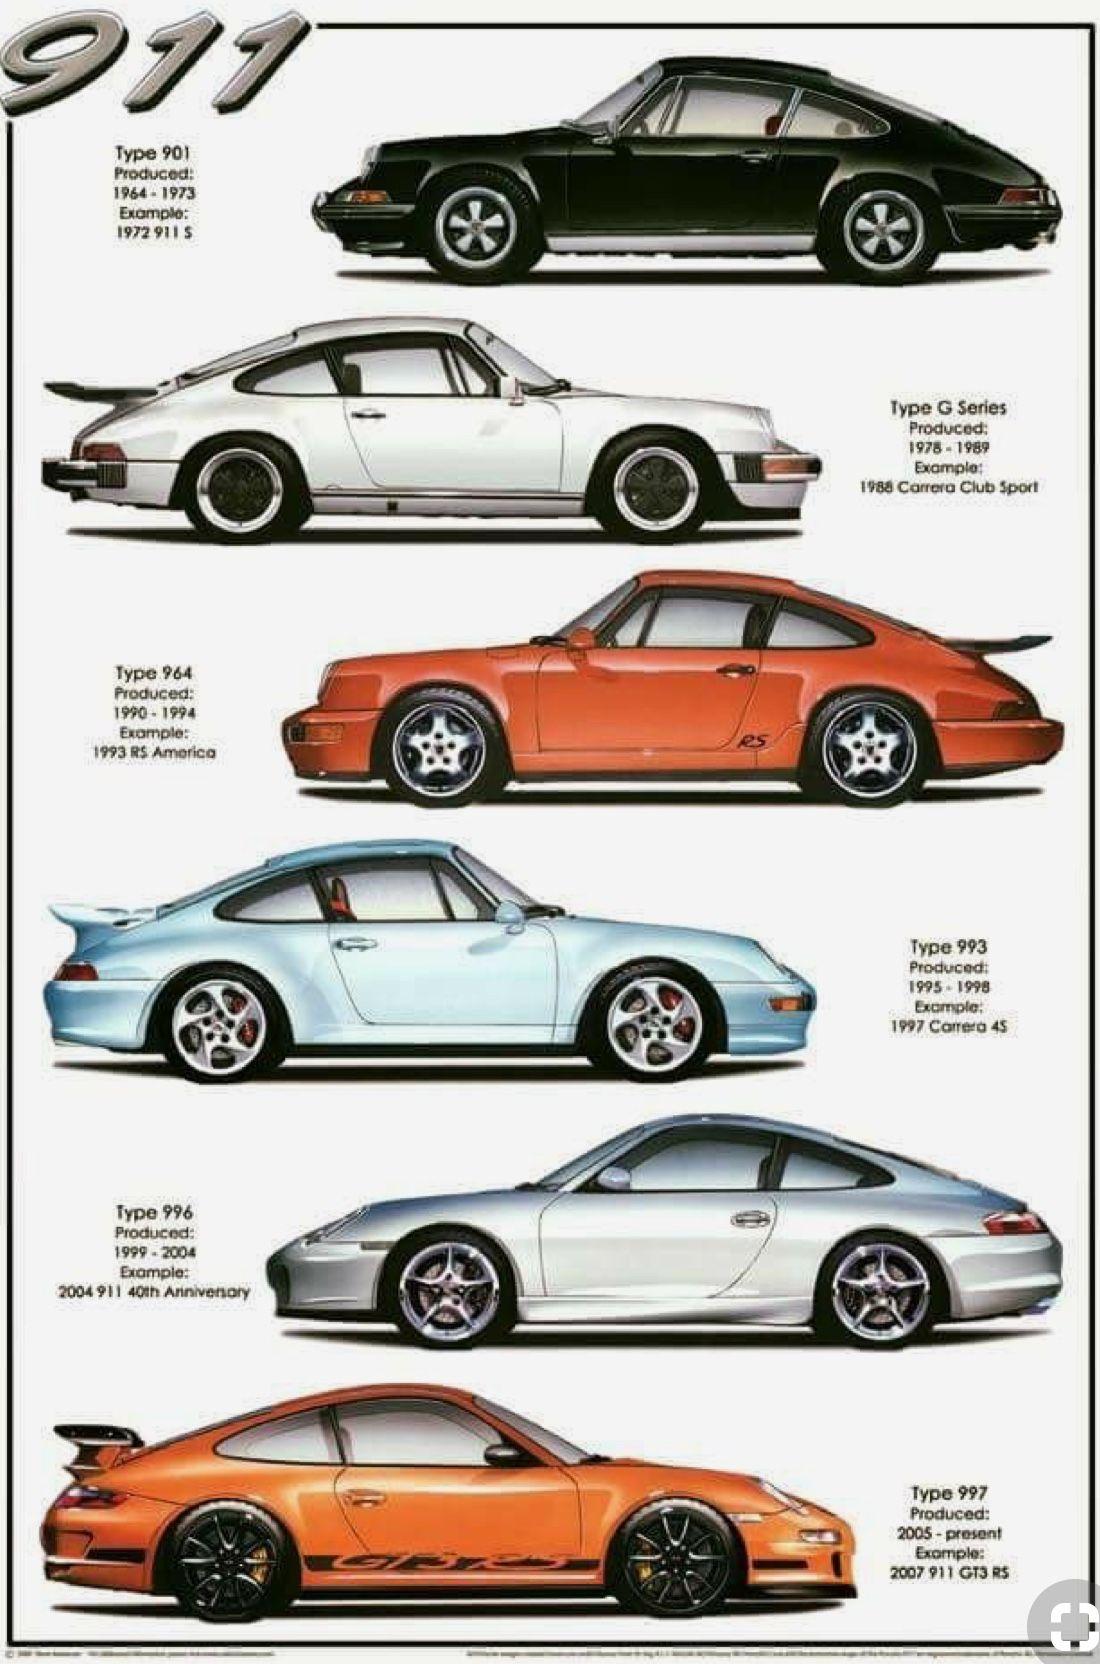 Pin By John Kim On Porsche Art Porsche 911 History Vintage Porsche Porsche Sports Car